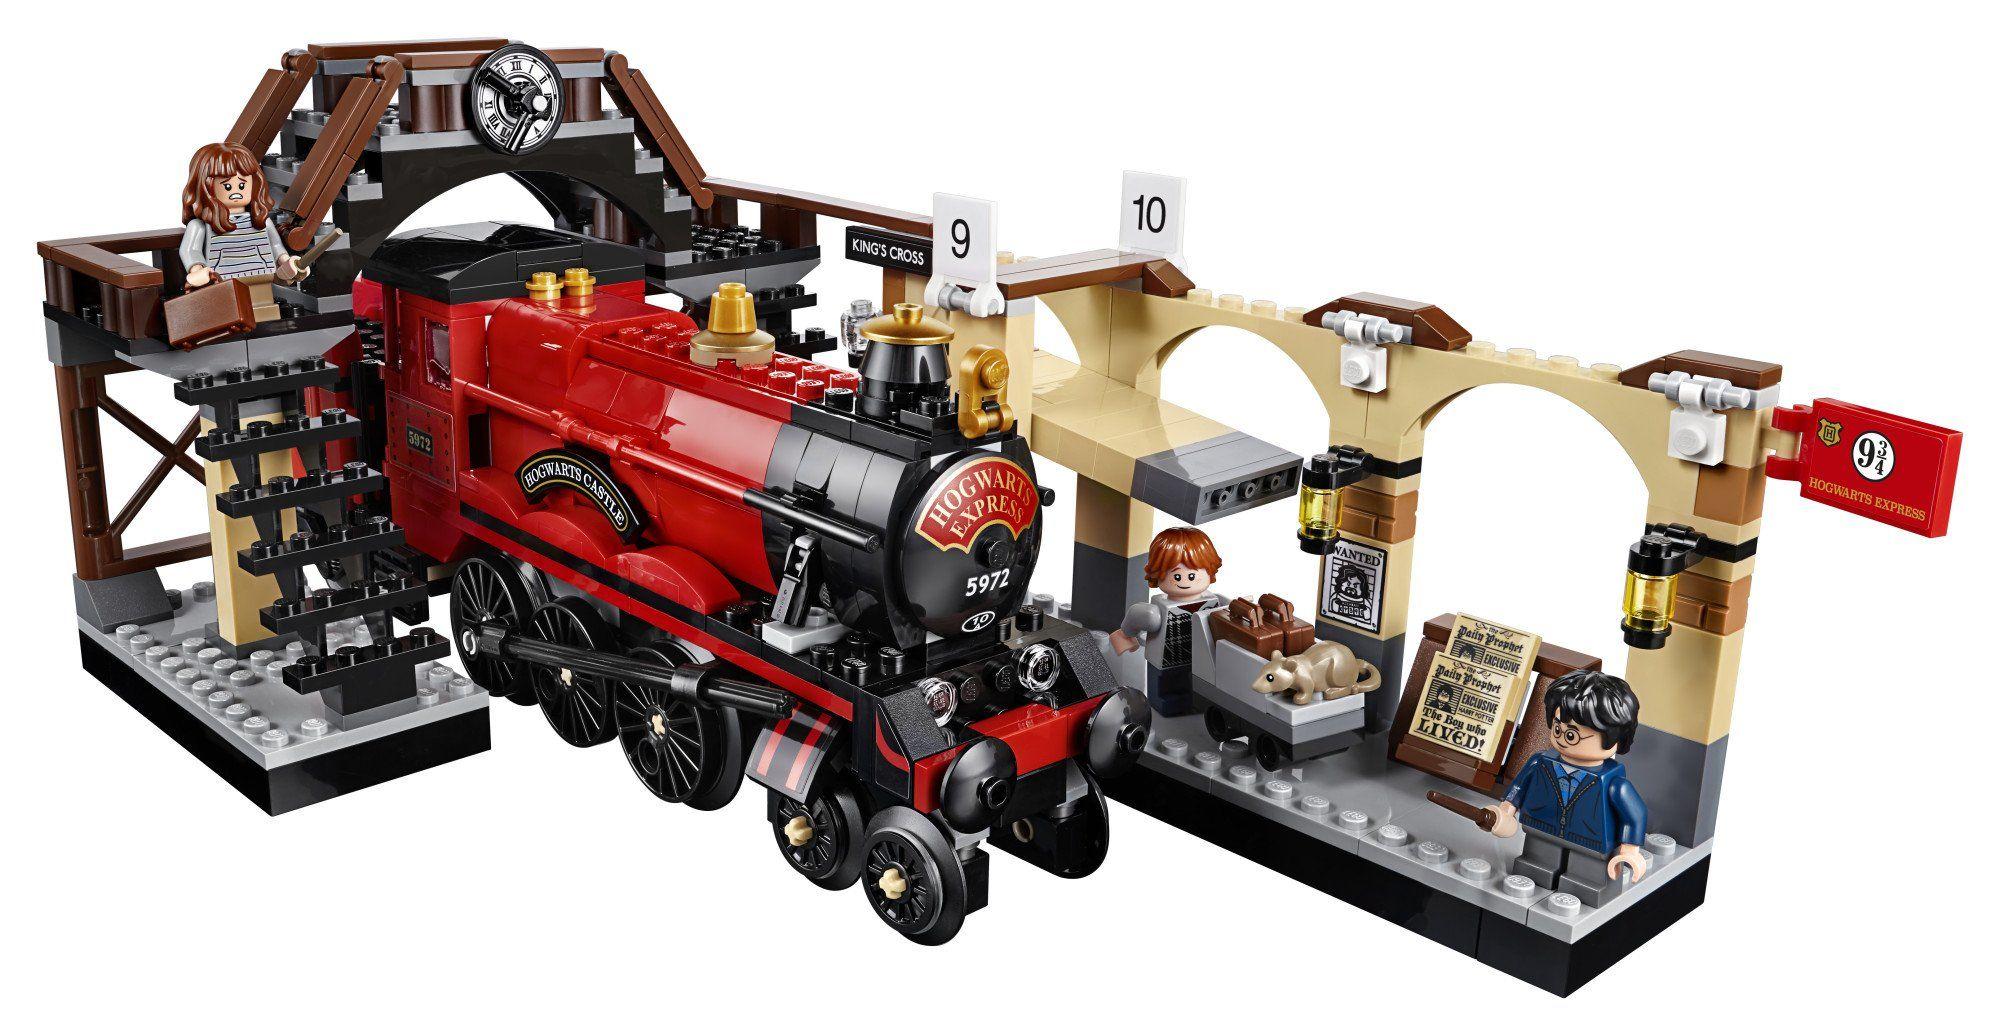 Lego Harry Potter Hogwarts Express 75955 Building Kit 801